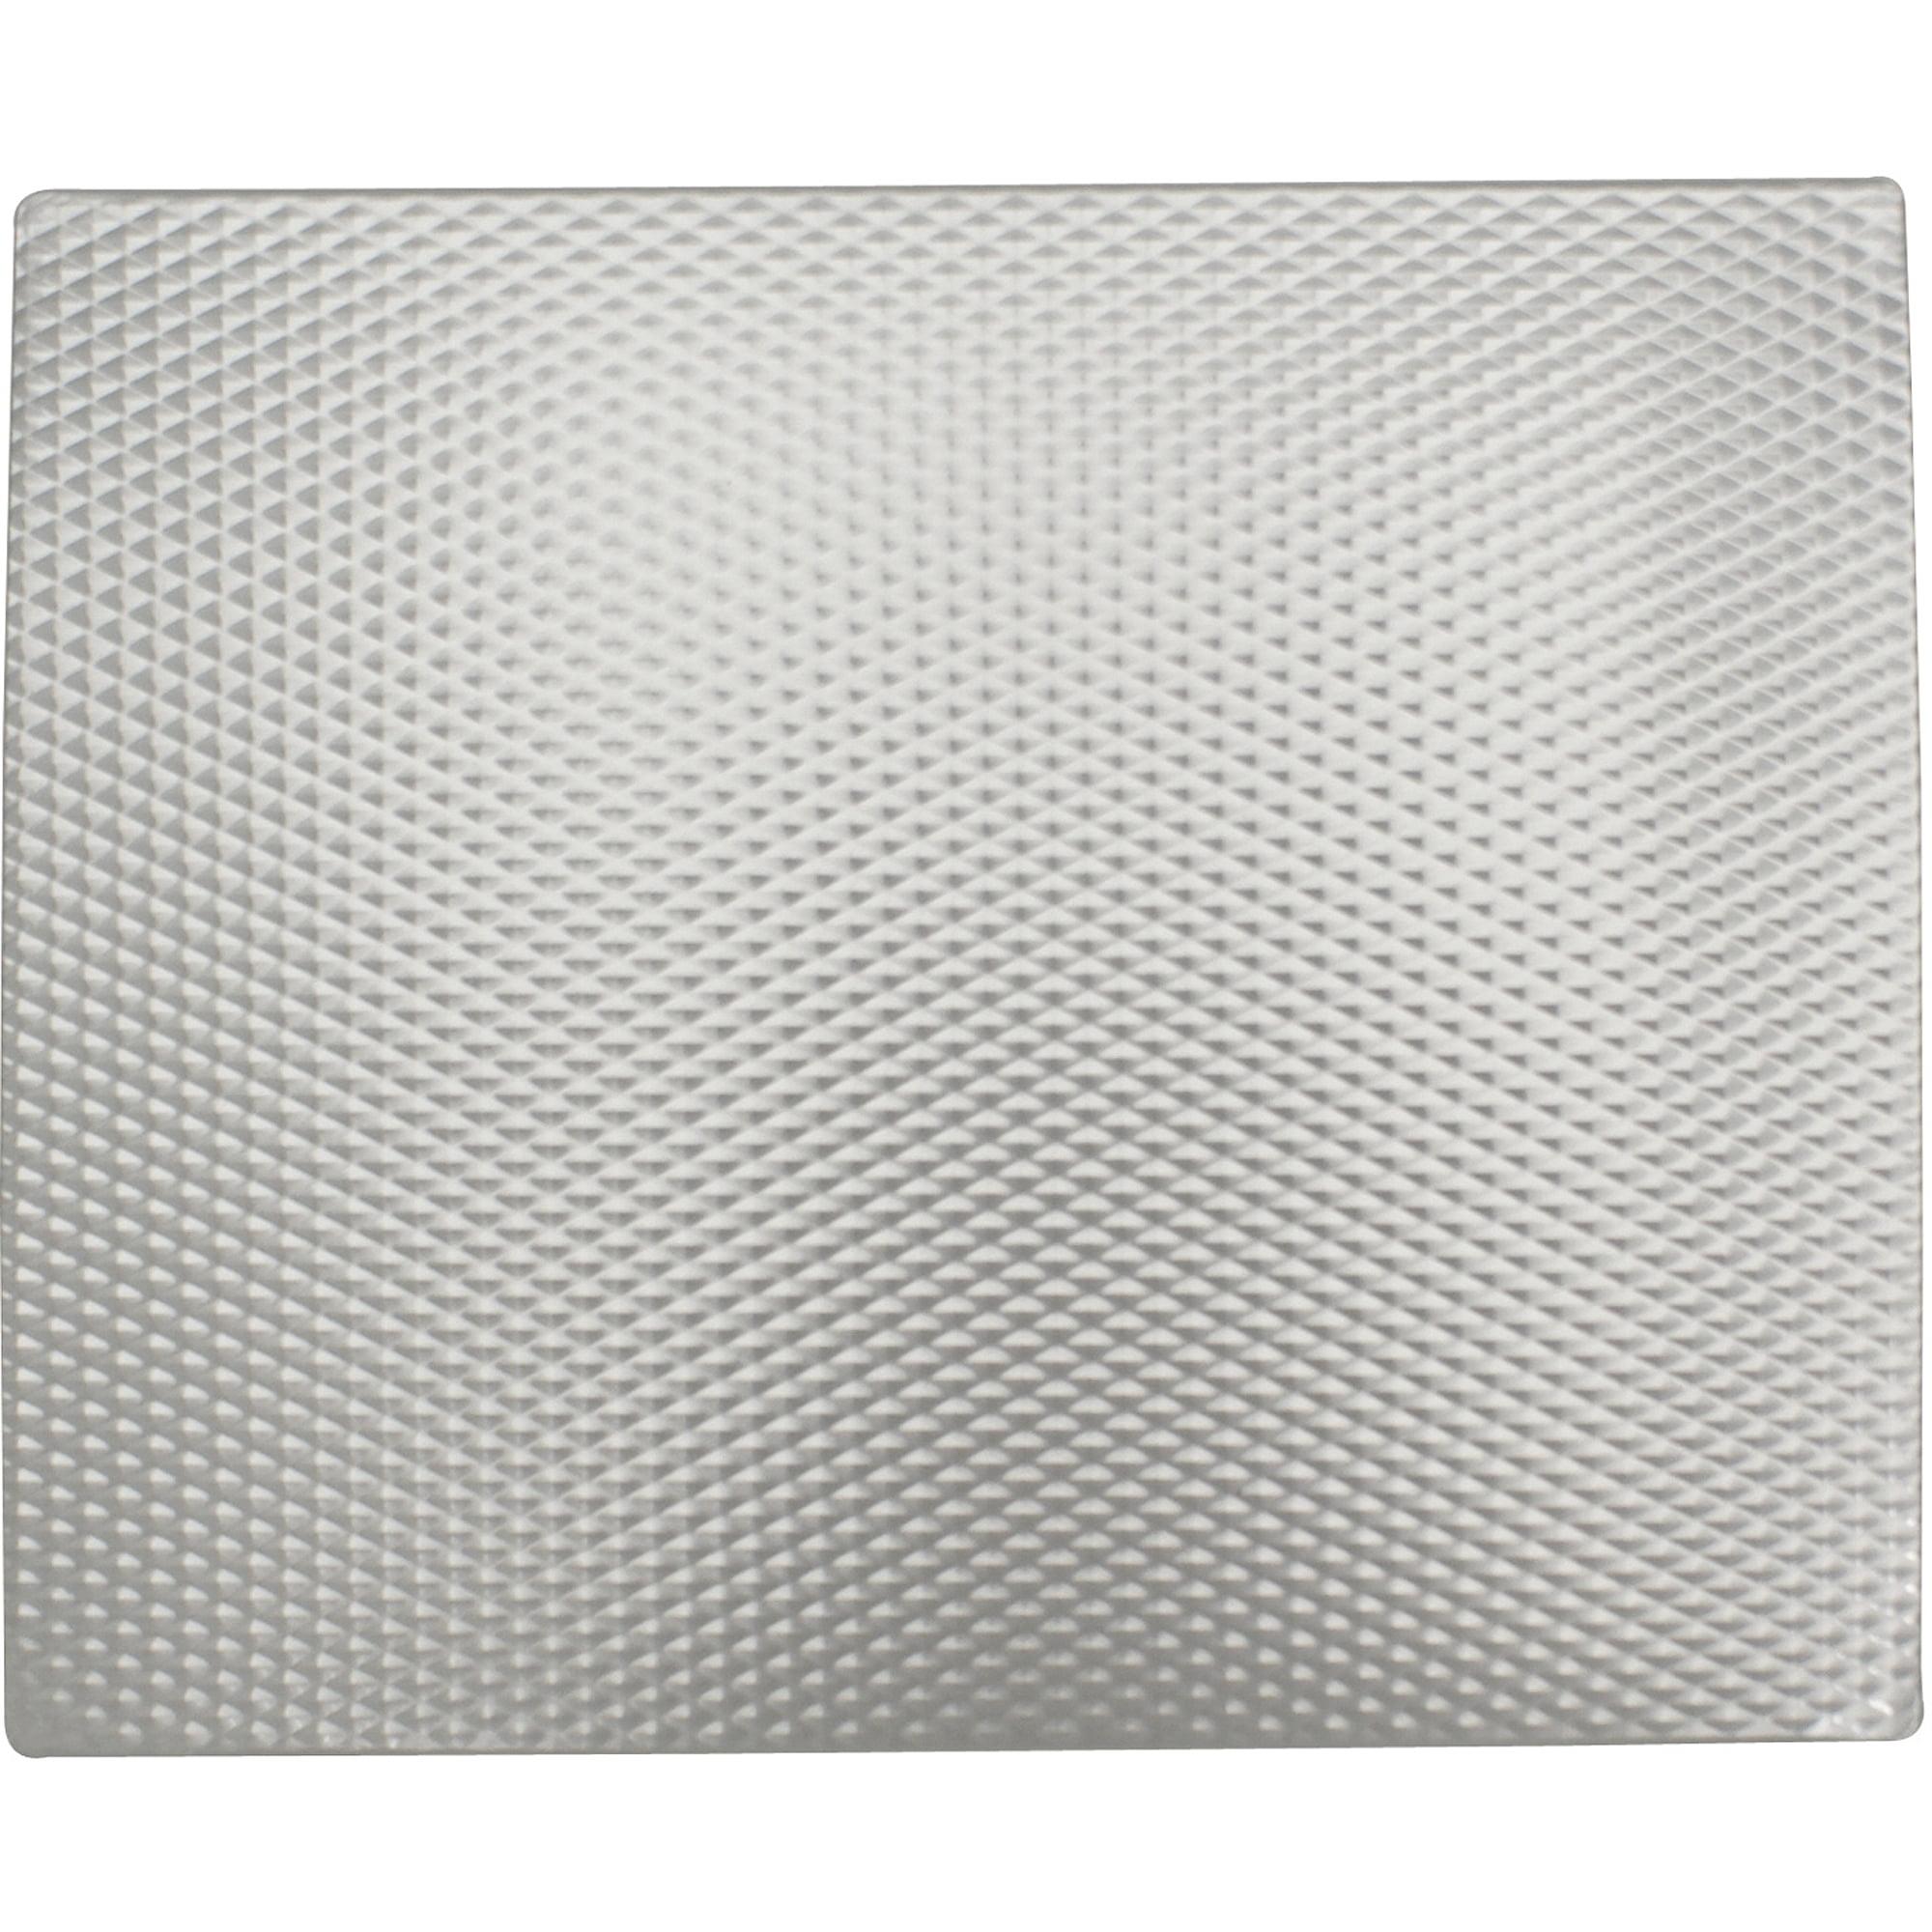 "Range Kleen 1-Piece Counter Mat, ""Silverwave"